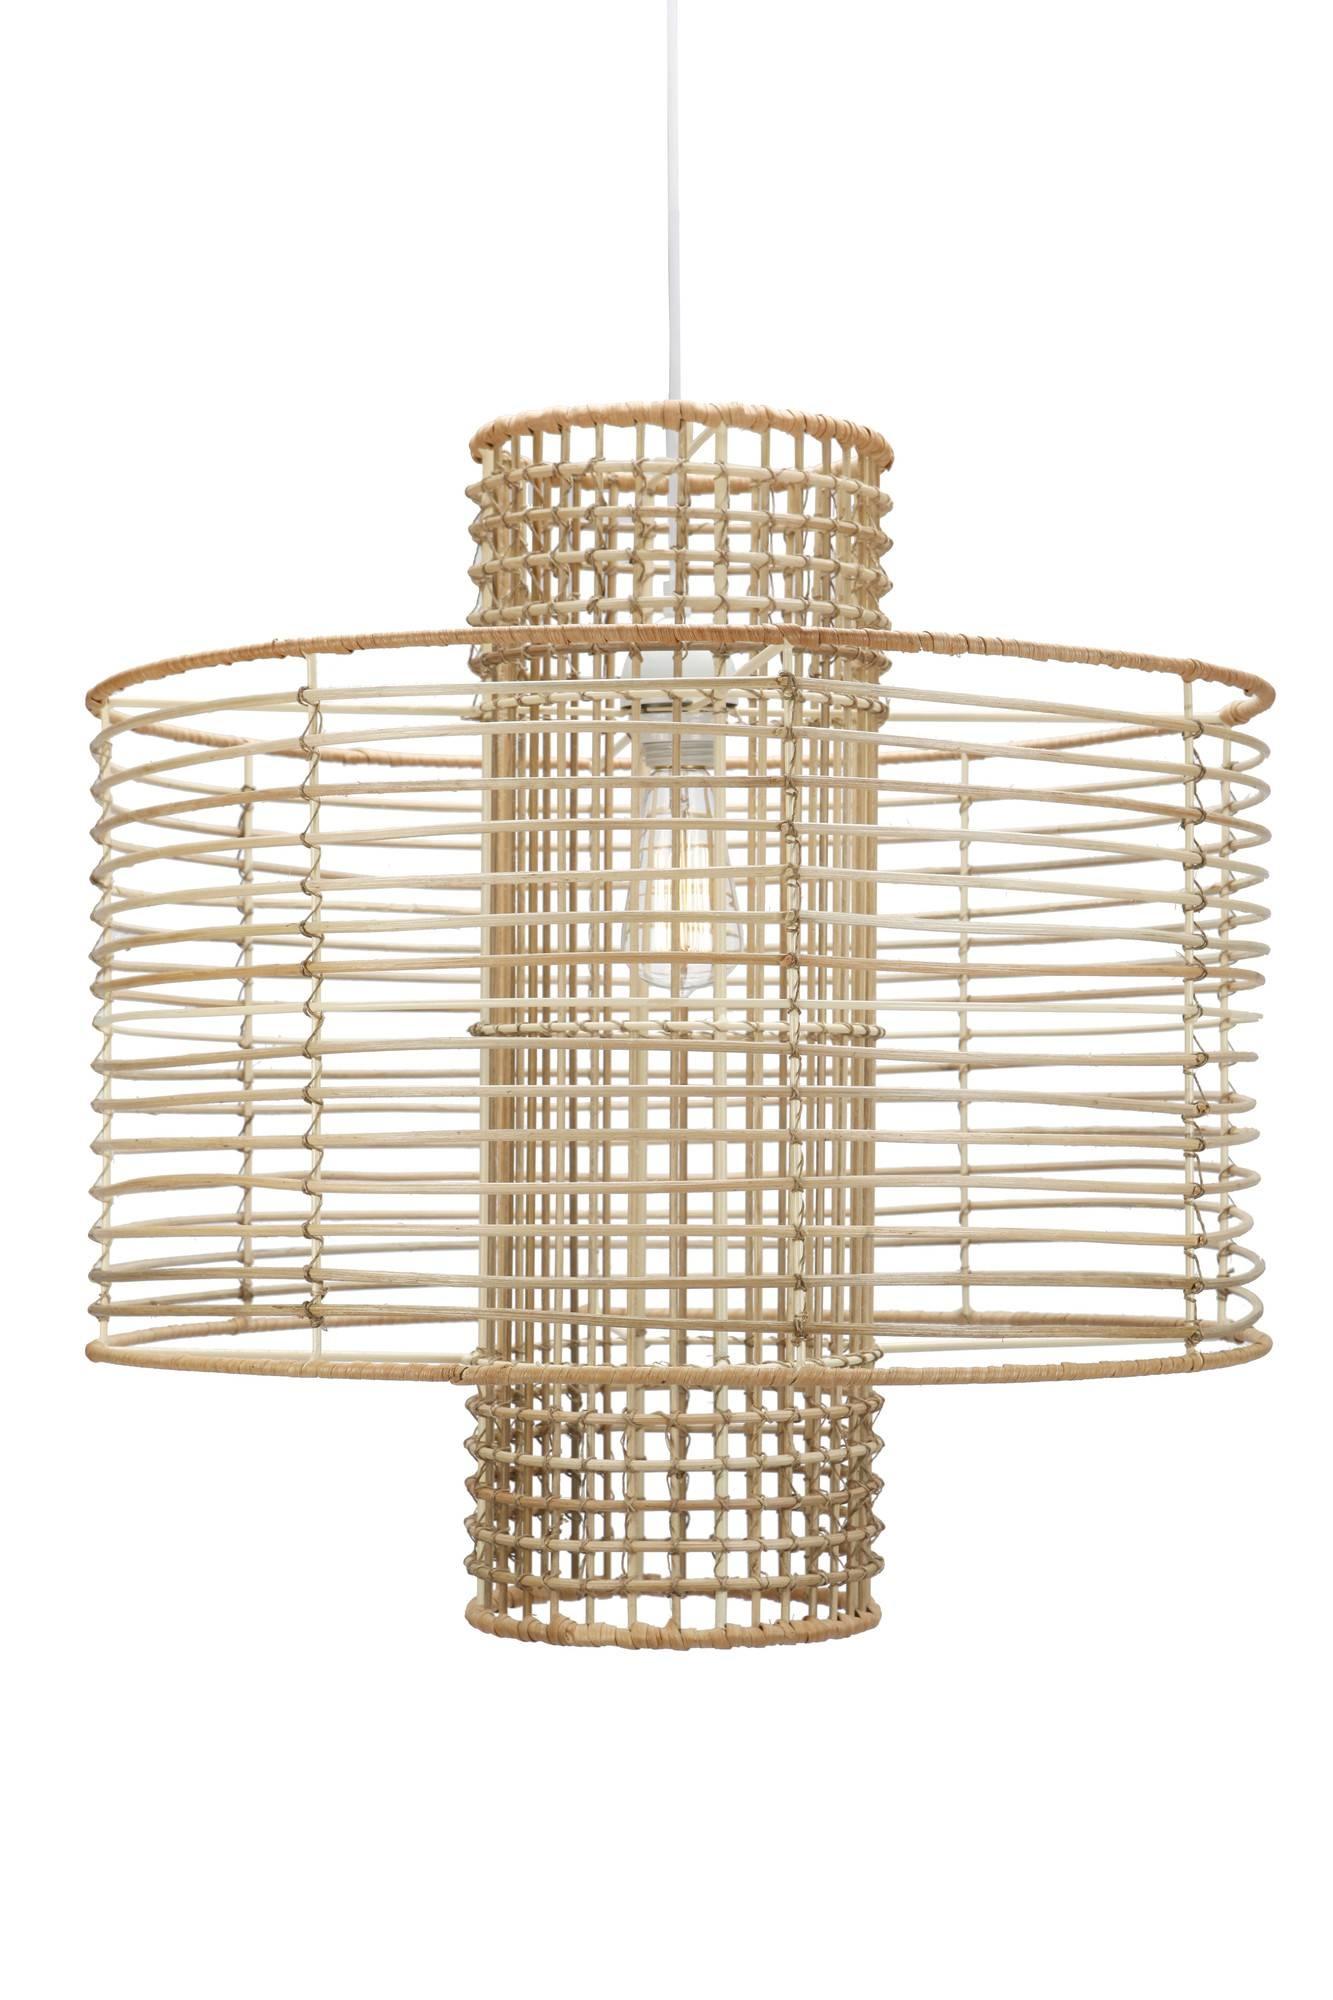 Anthropologie Deco Rattan Pendant Lamp   Decor Look Alikes for Rattan Pendant Lighting (Image 2 of 15)